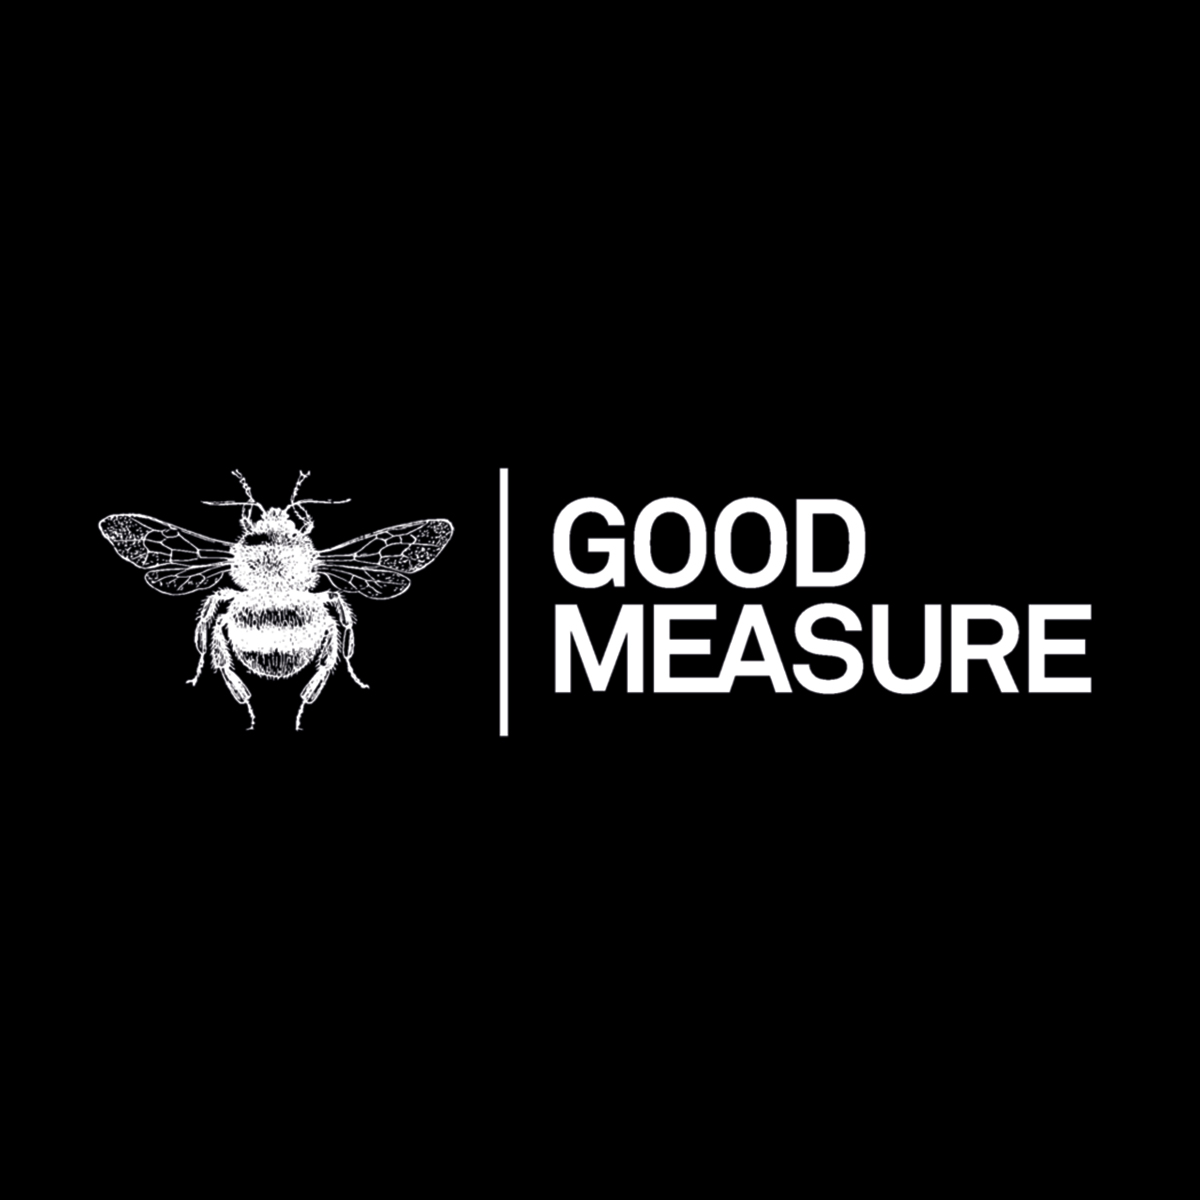 GOOD-MEASURE